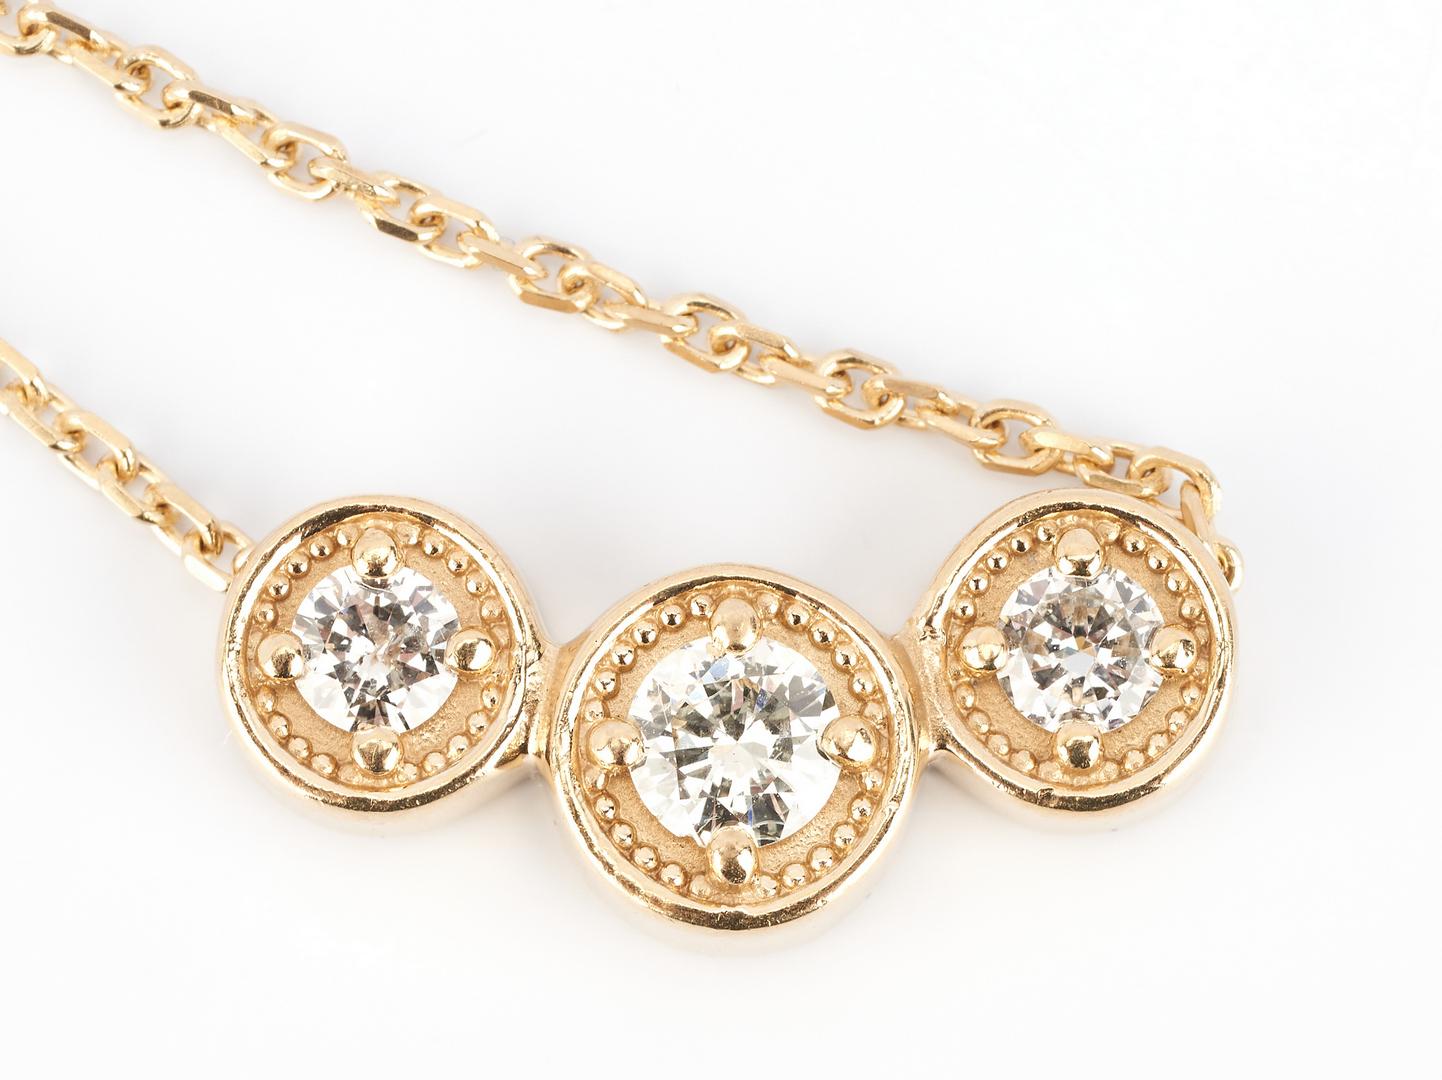 Lot 490: Ladies 14K & Diamond Necklace